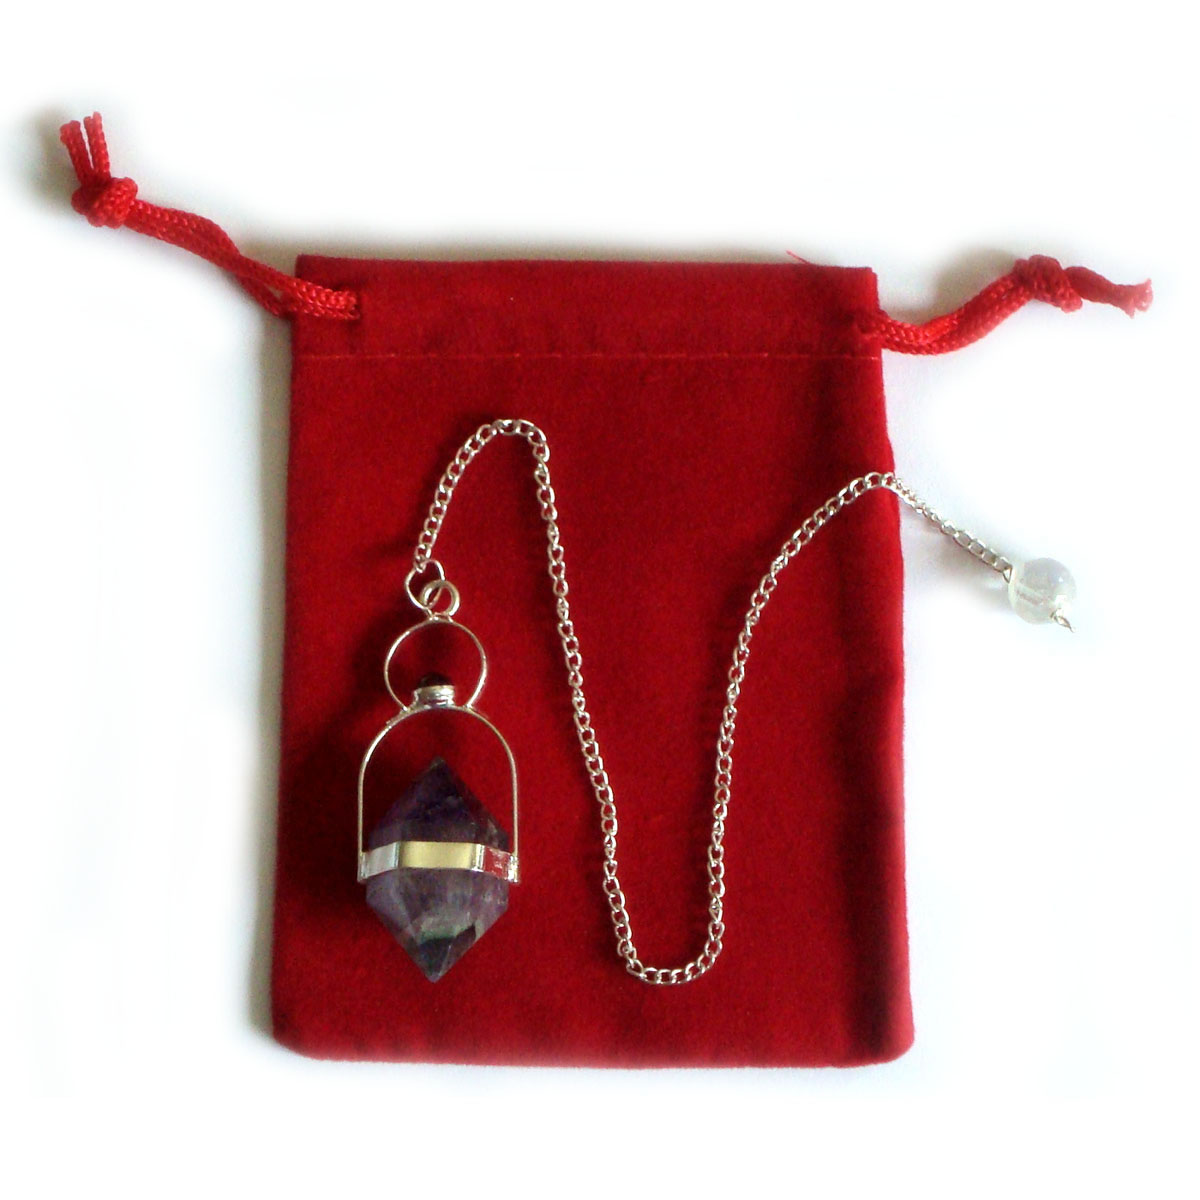 Crystal Pendulum - AMETHYST HERIKMER with GARNET CAB